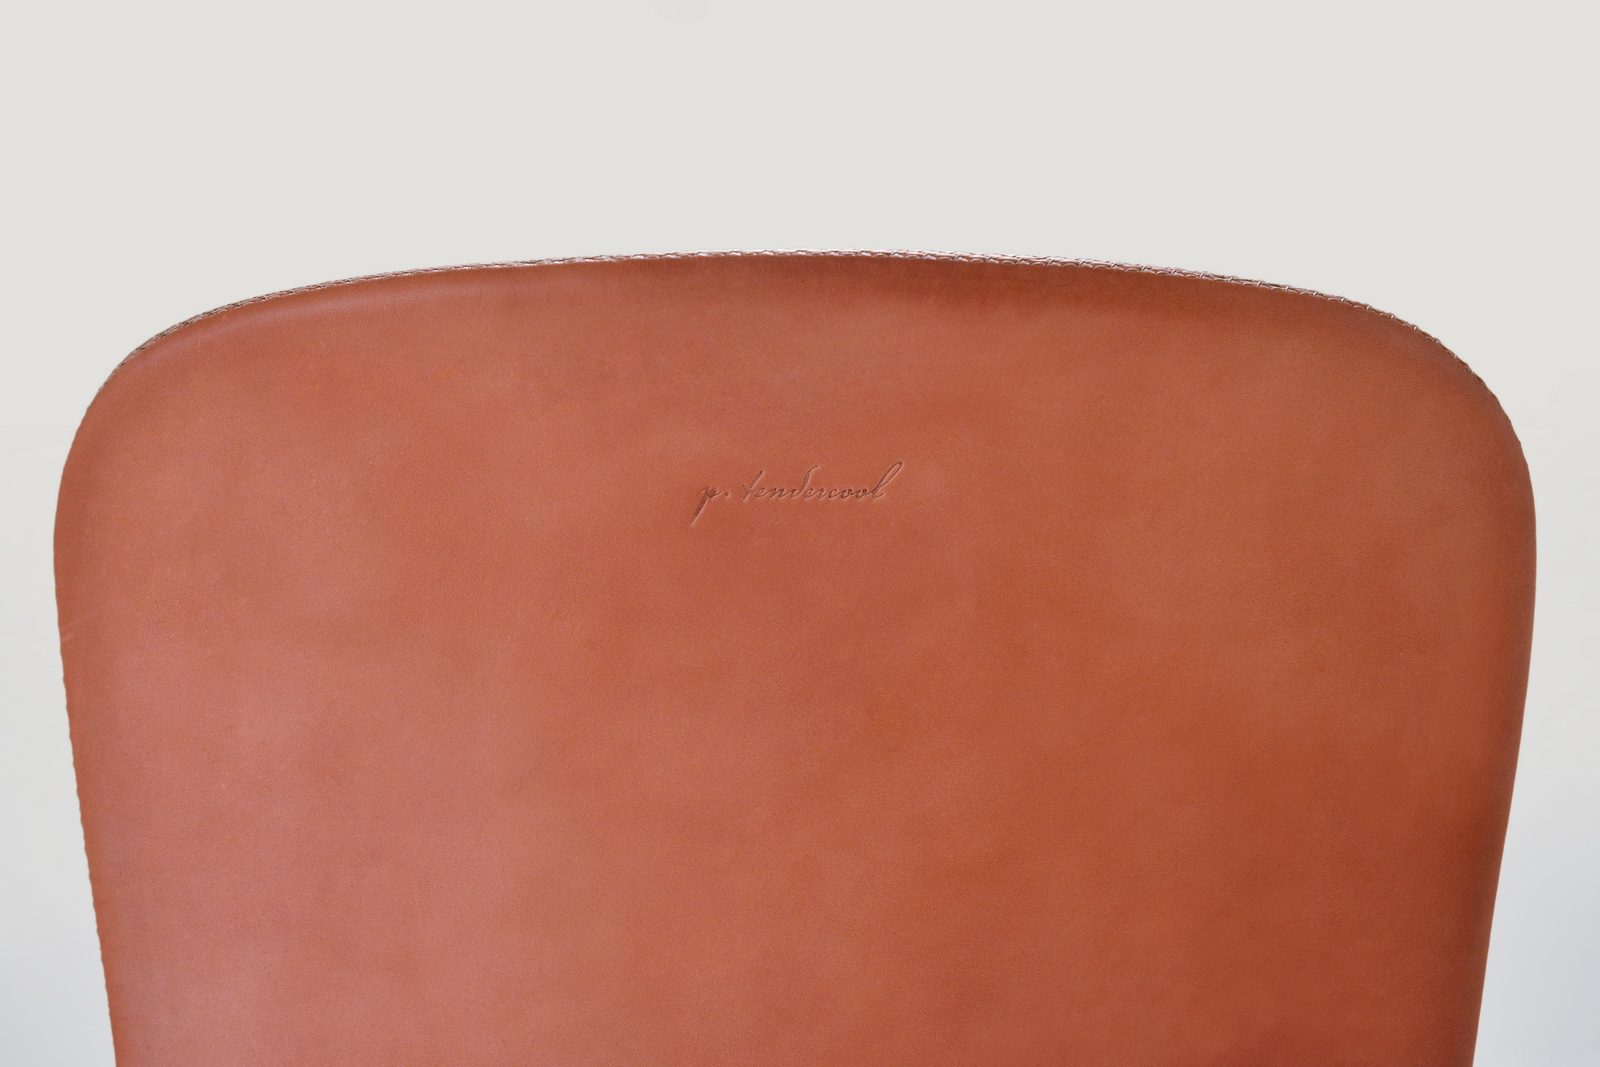 PTendercool-Chair-PT471-BS1-VR-200218-06